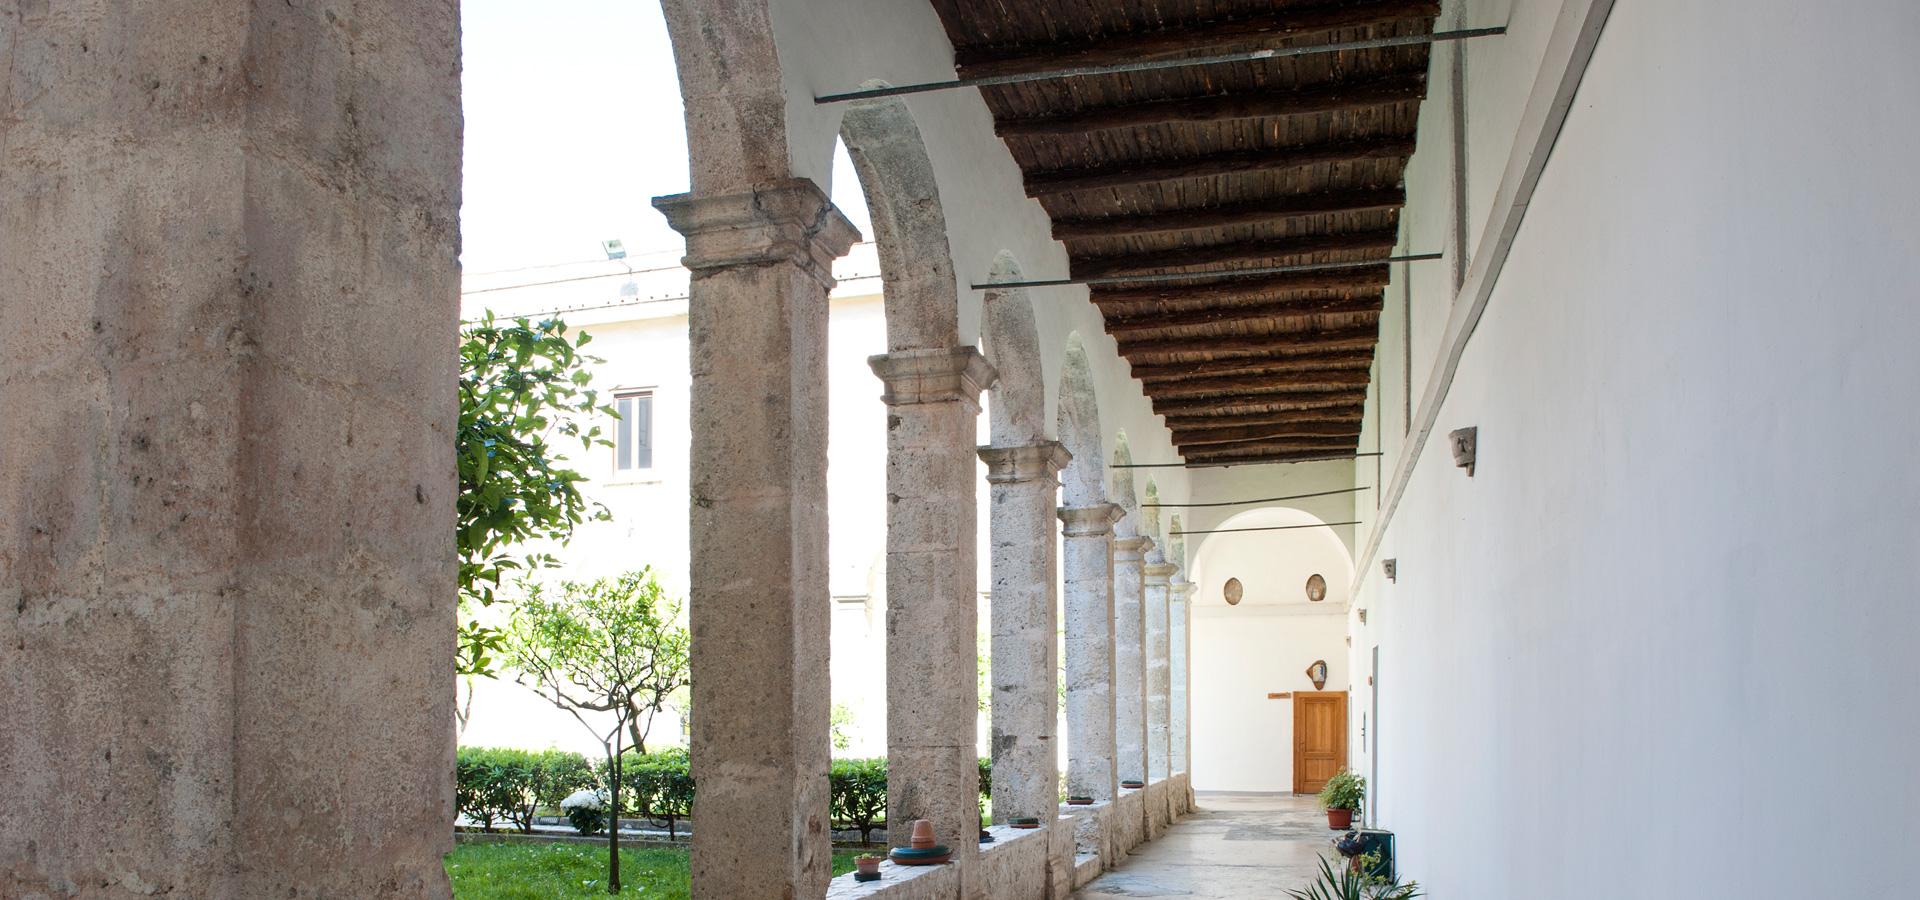 Badia San Pietro alli Marmi 03